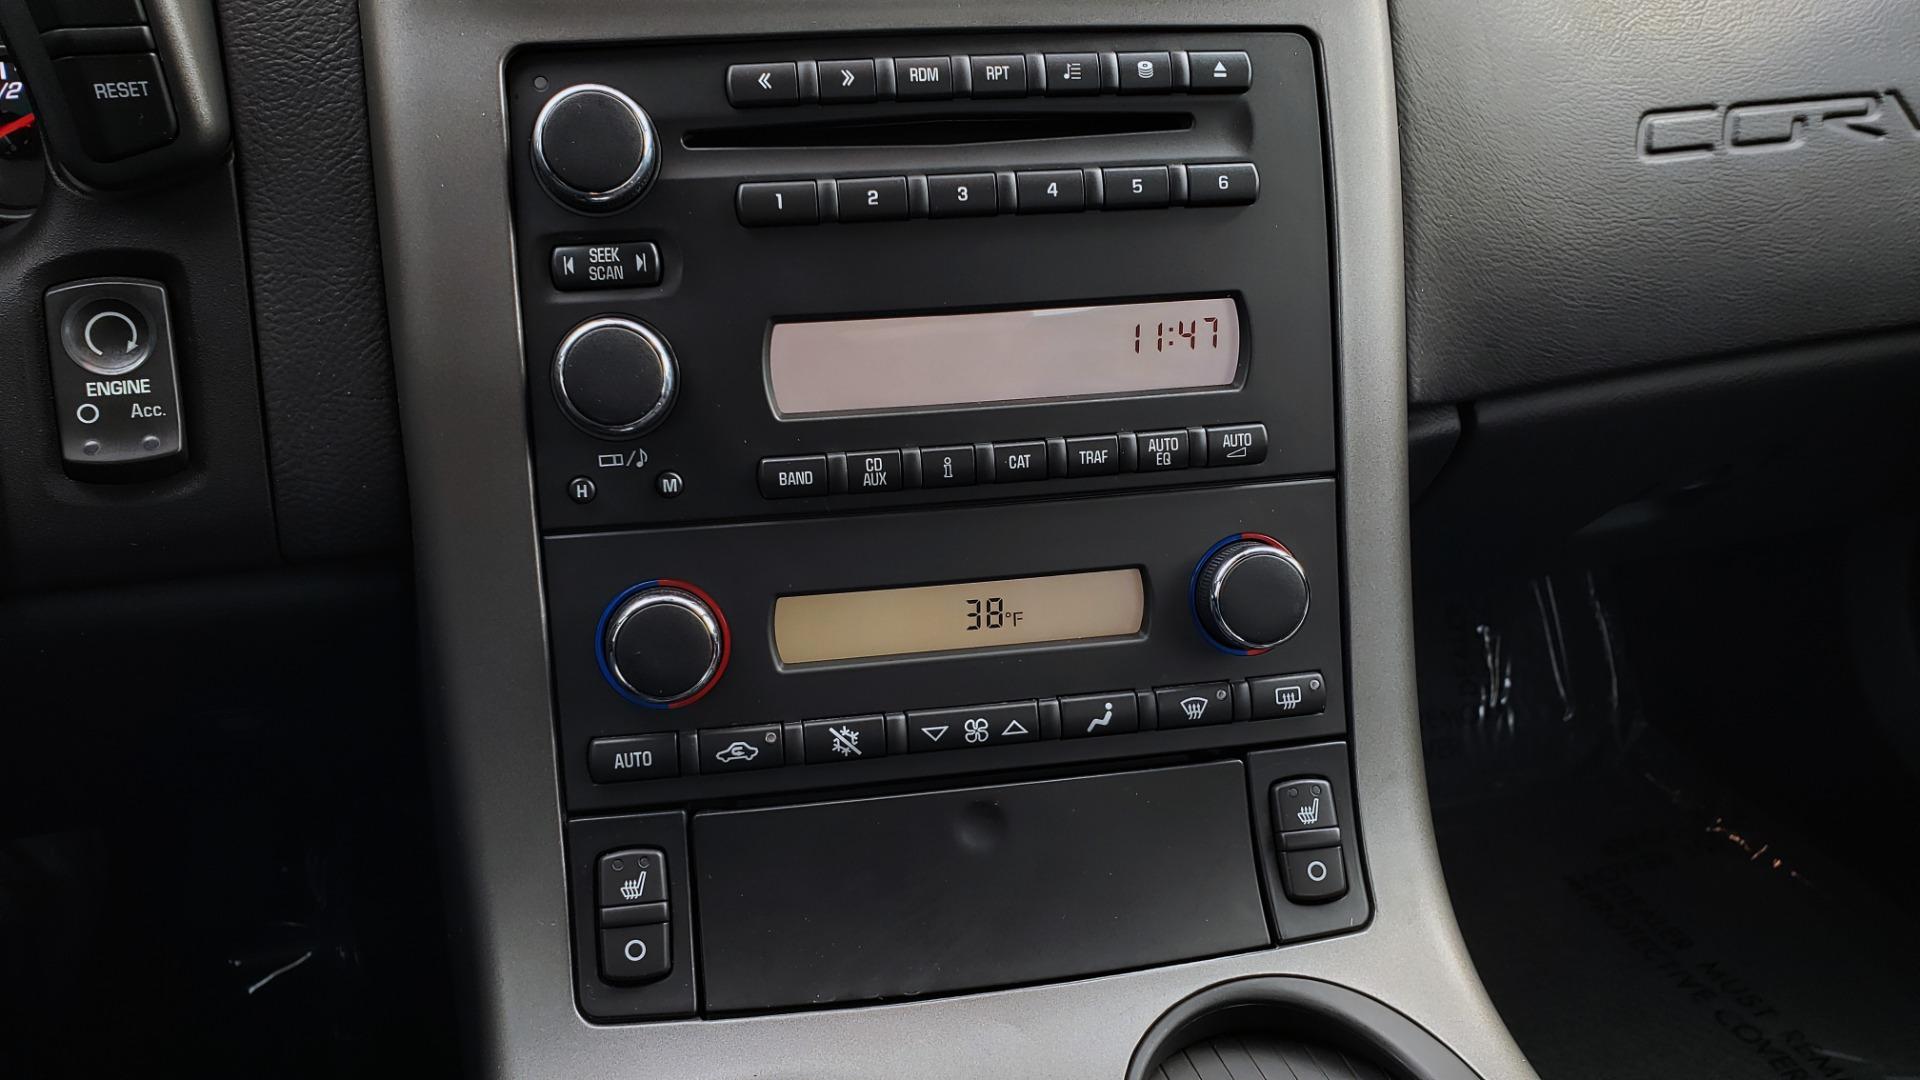 Used 2007 Chevrolet CORVETTE Z06 2LZ / 7.0L 427 V8 / 6-SPD MAN / BOSE / POLISHED WHEELS for sale Sold at Formula Imports in Charlotte NC 28227 67